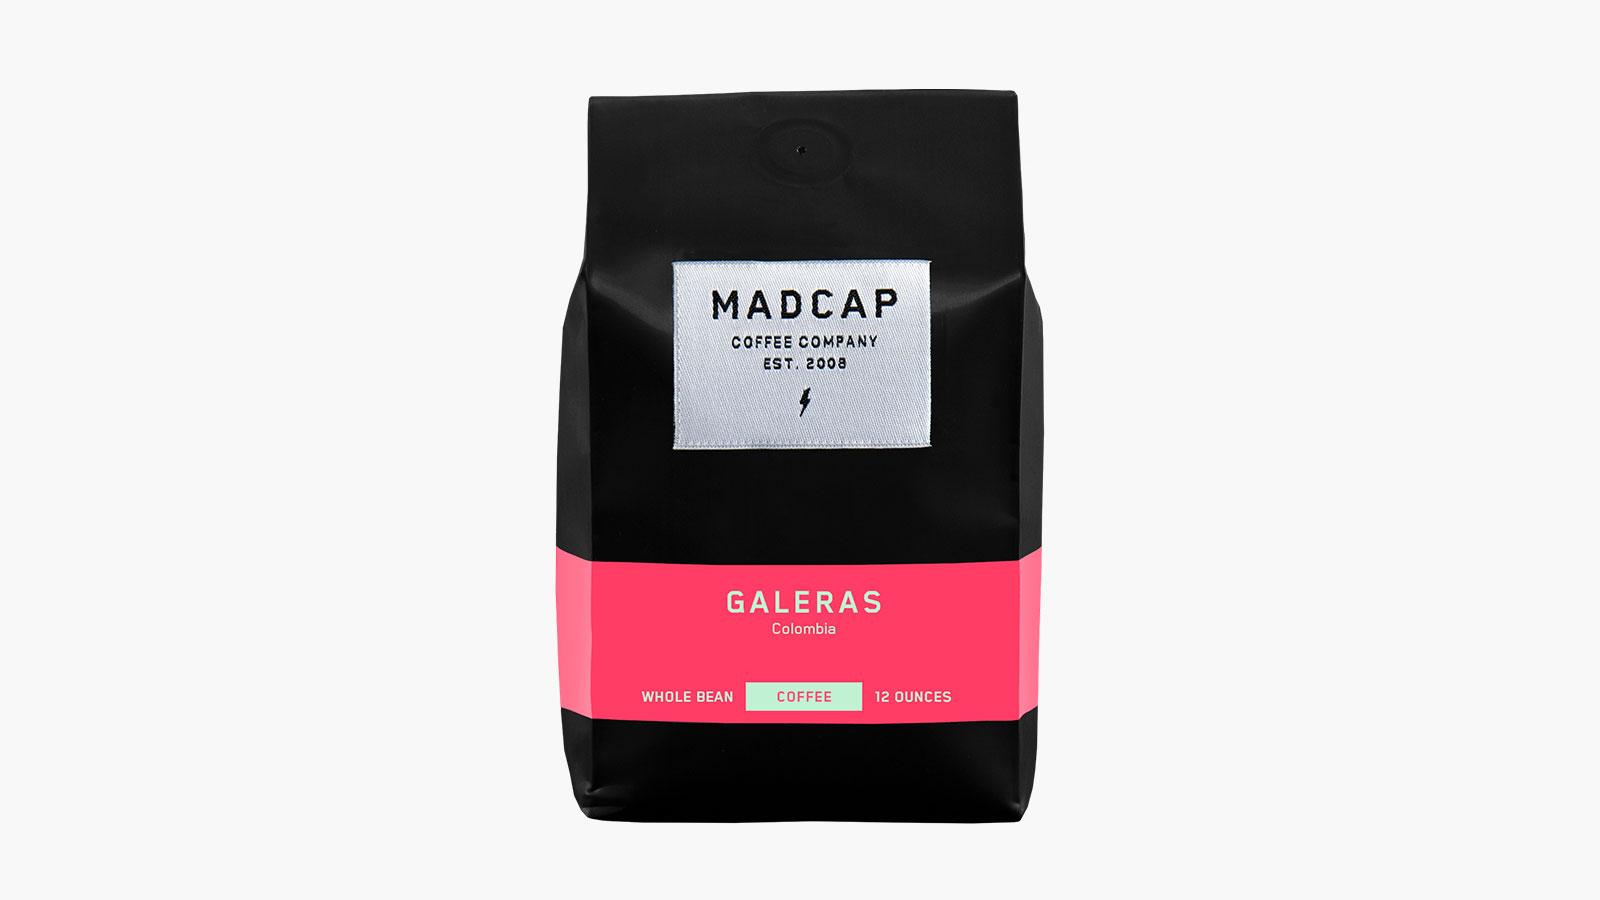 Madcap GalerasCoffee